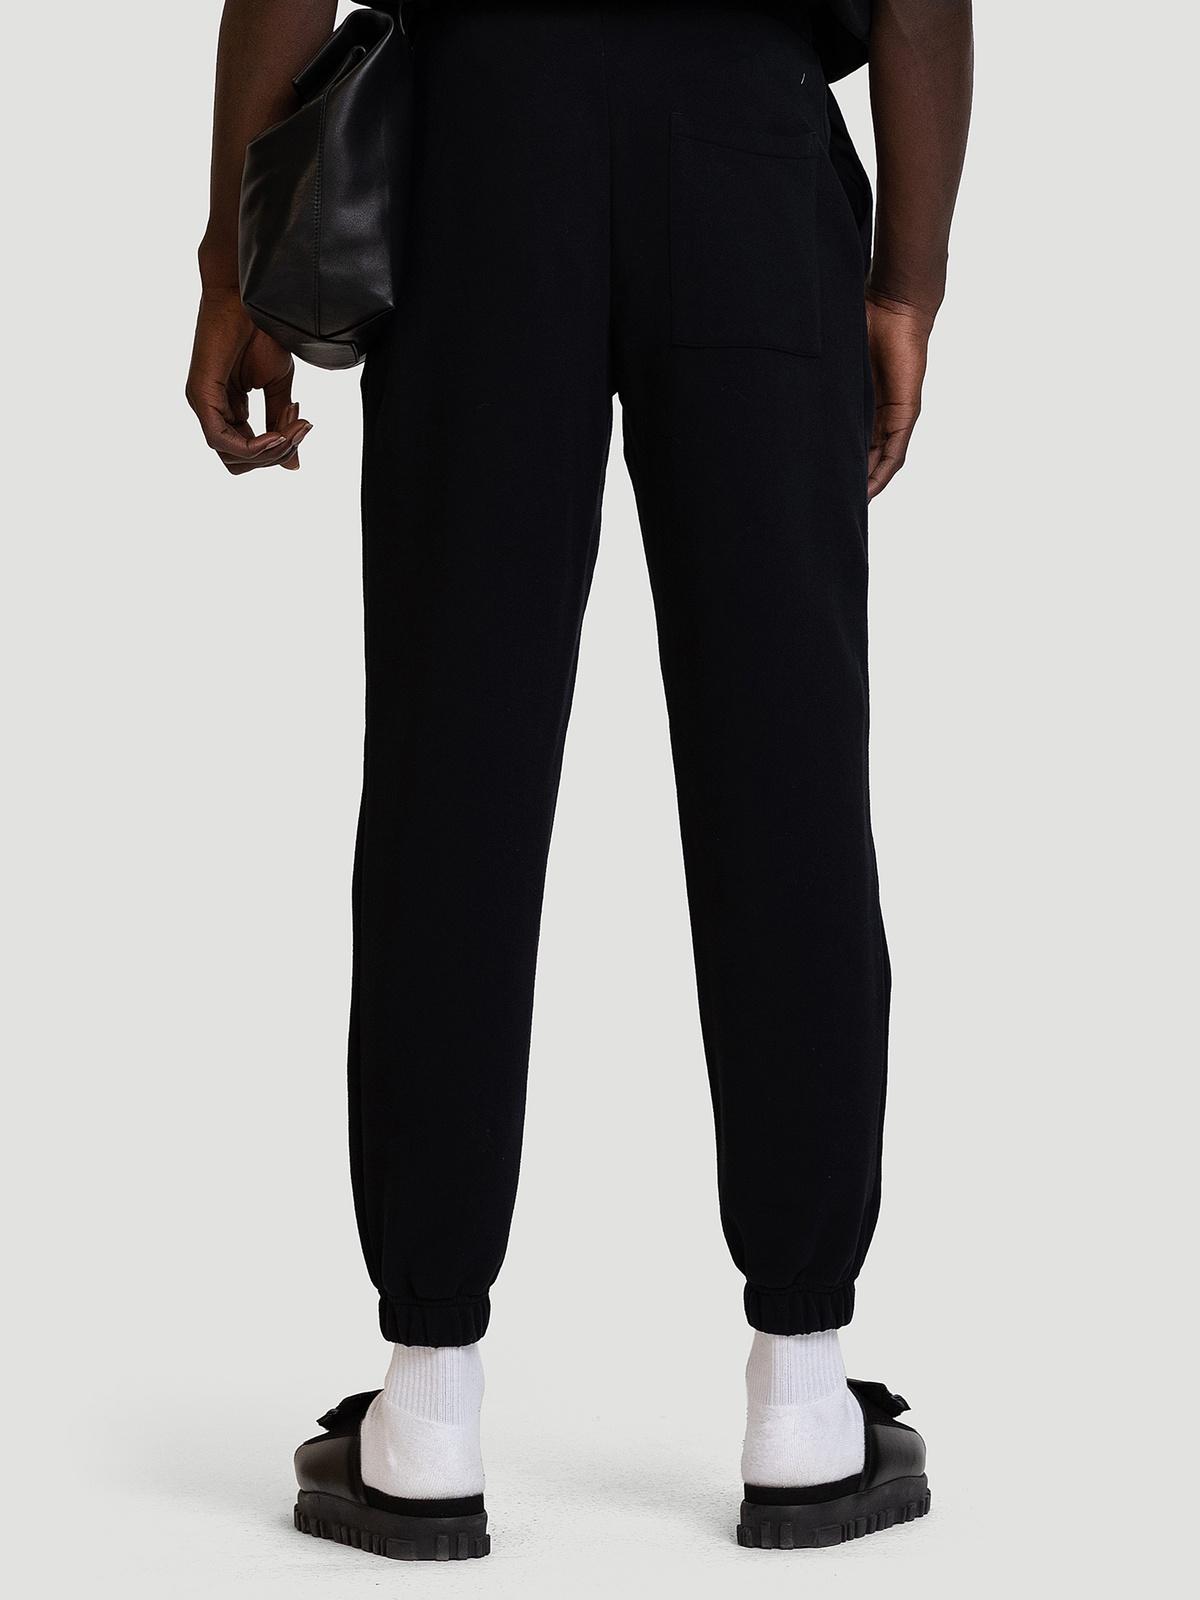 M. Oslo Sweat Trouser Black 3